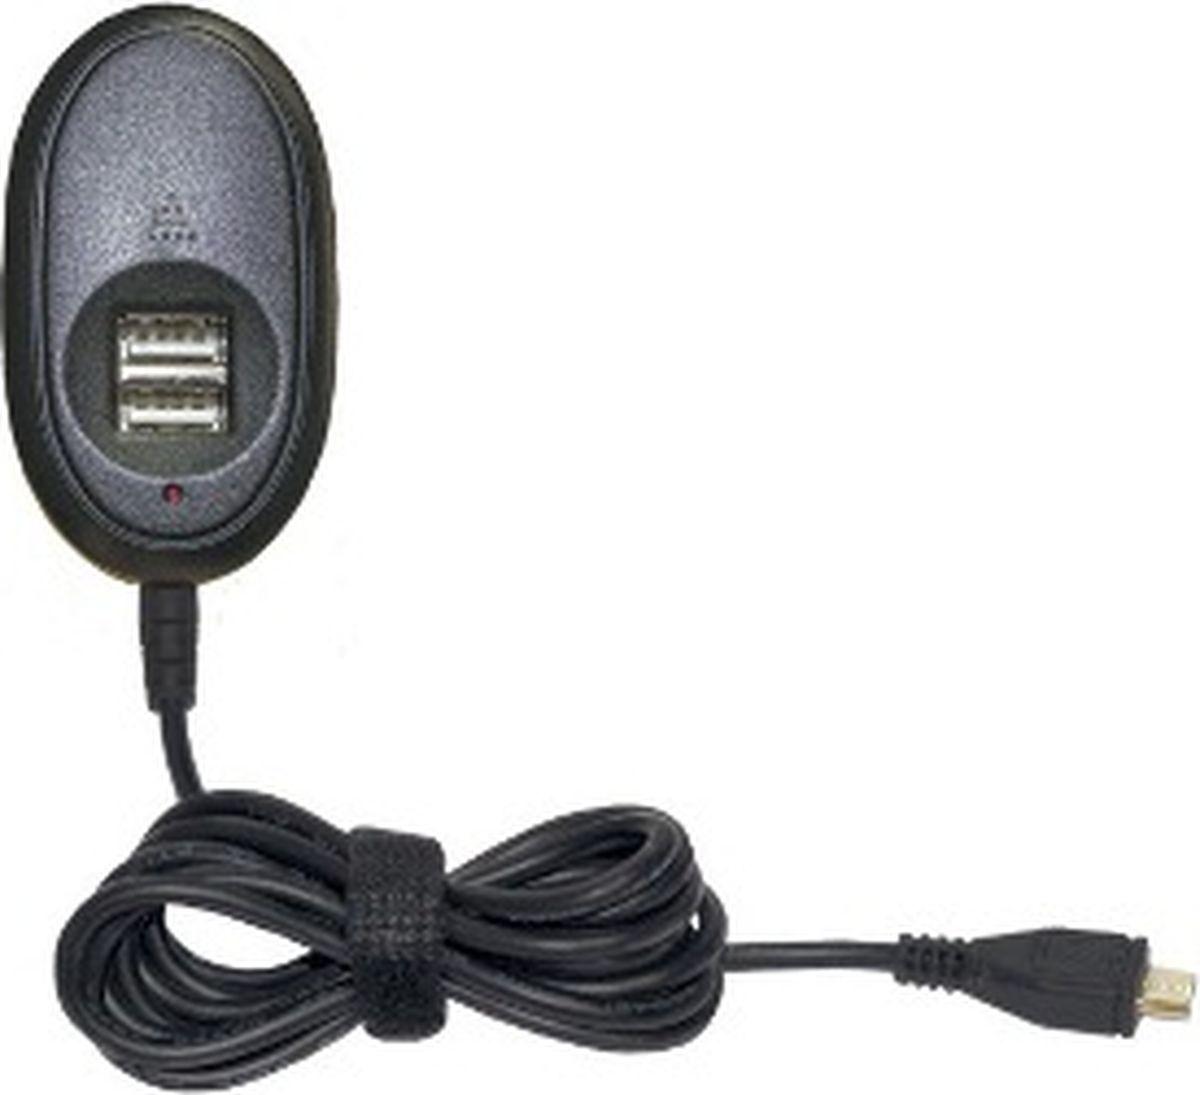 Ginzzu GA-3412UB, Black сетевое зарядное устройство + кабель micro USB ginzzu ga 3003b black сетевое зарядное устройство 1 2 a